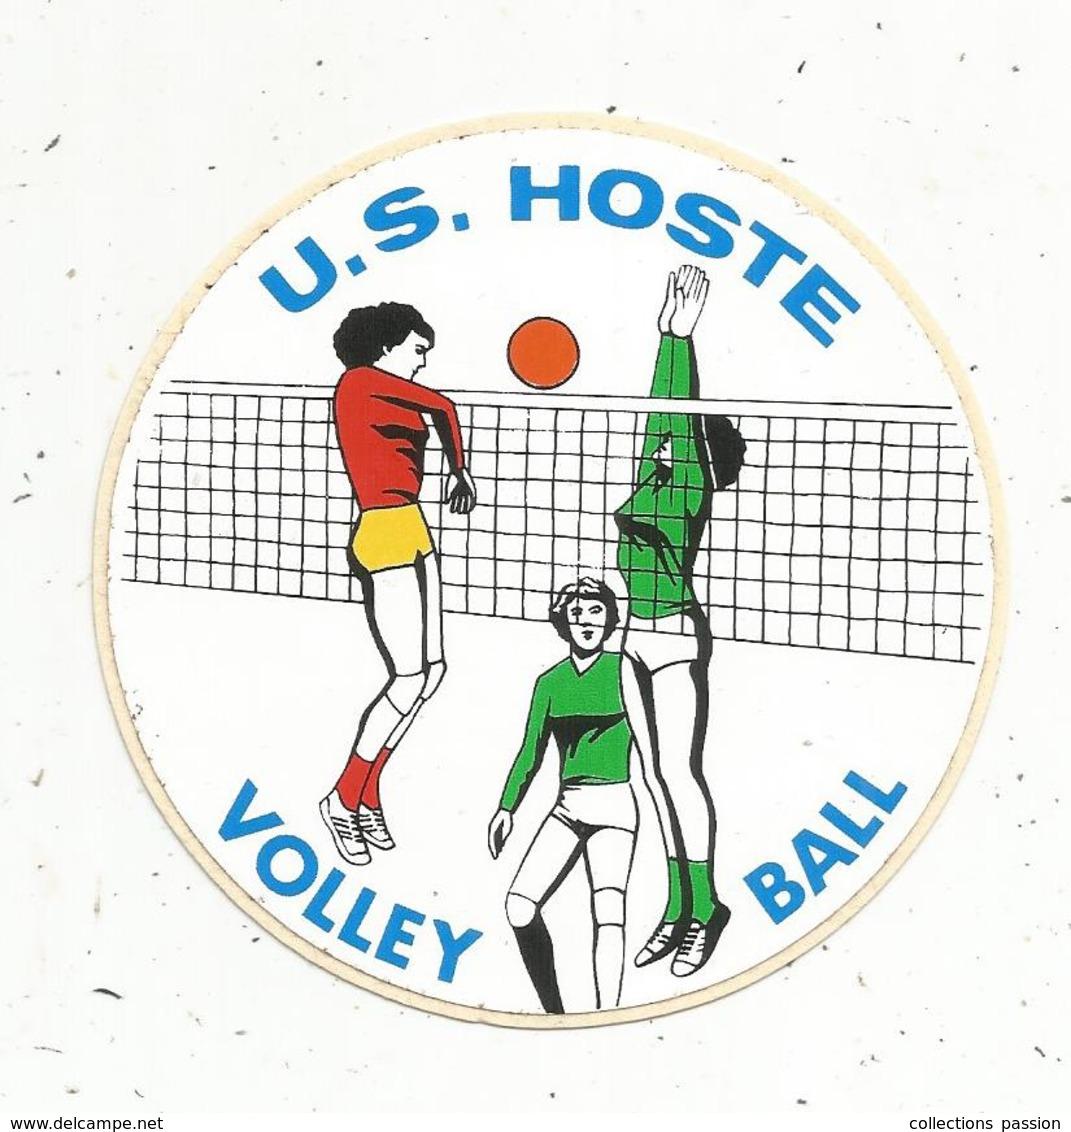 Autocollant , Sports , U.S. HOSTE , VOLLEY BALL ,  MOSELLE - Autocollants